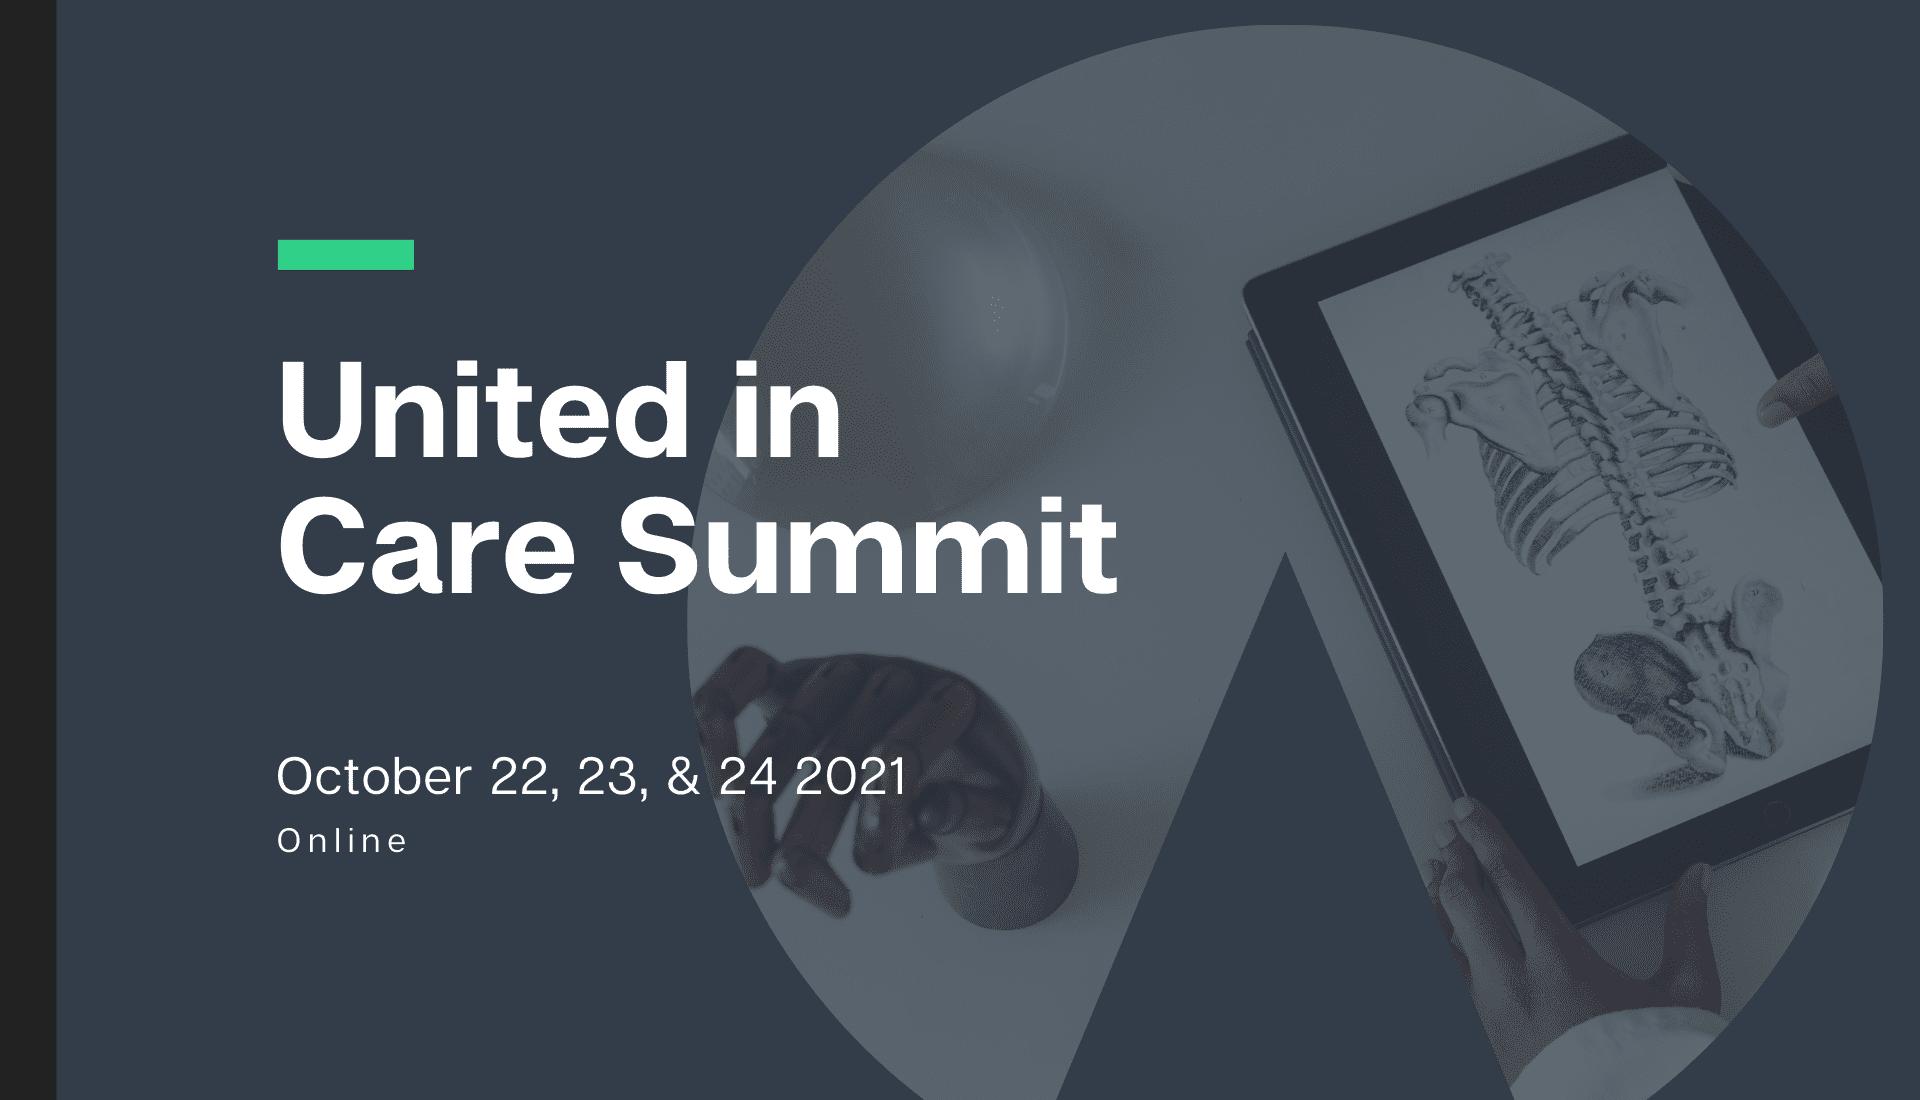 United in Care Summit